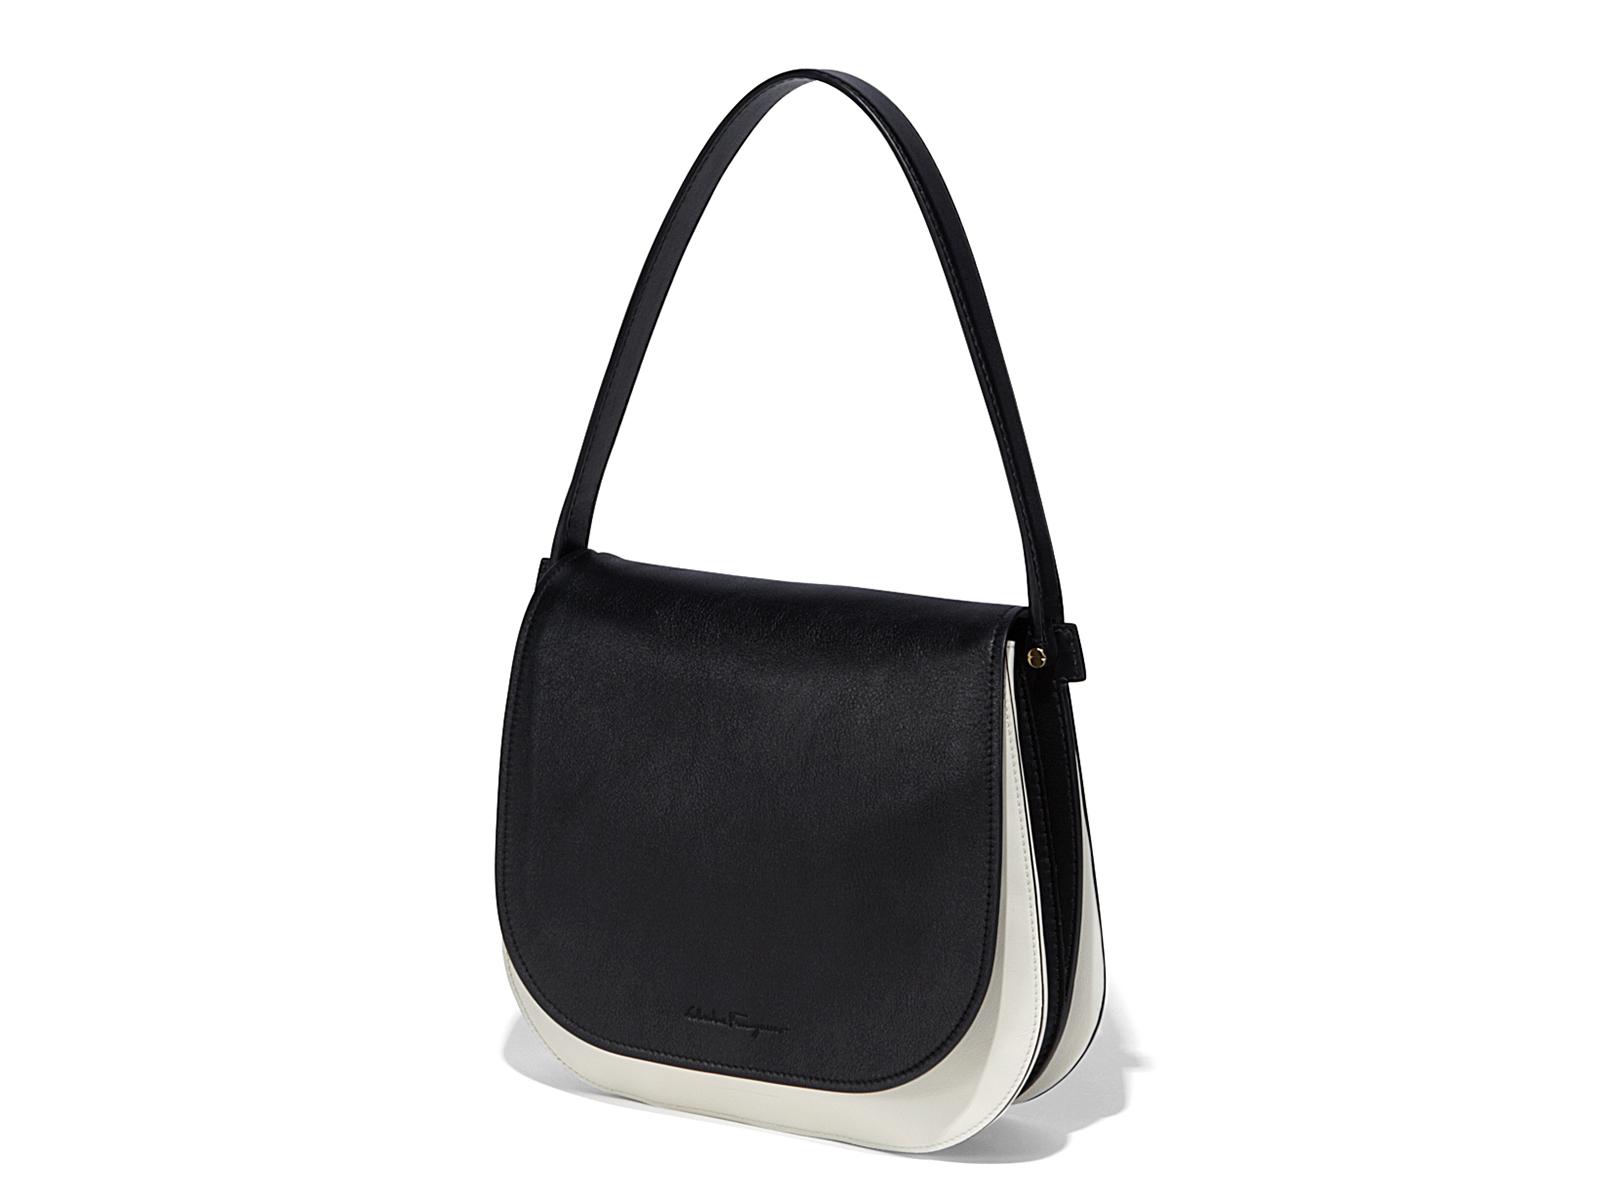 e2248bb6e309 Lyst - Ferragamo Bicolor Gancio Shoulder Bag in Black